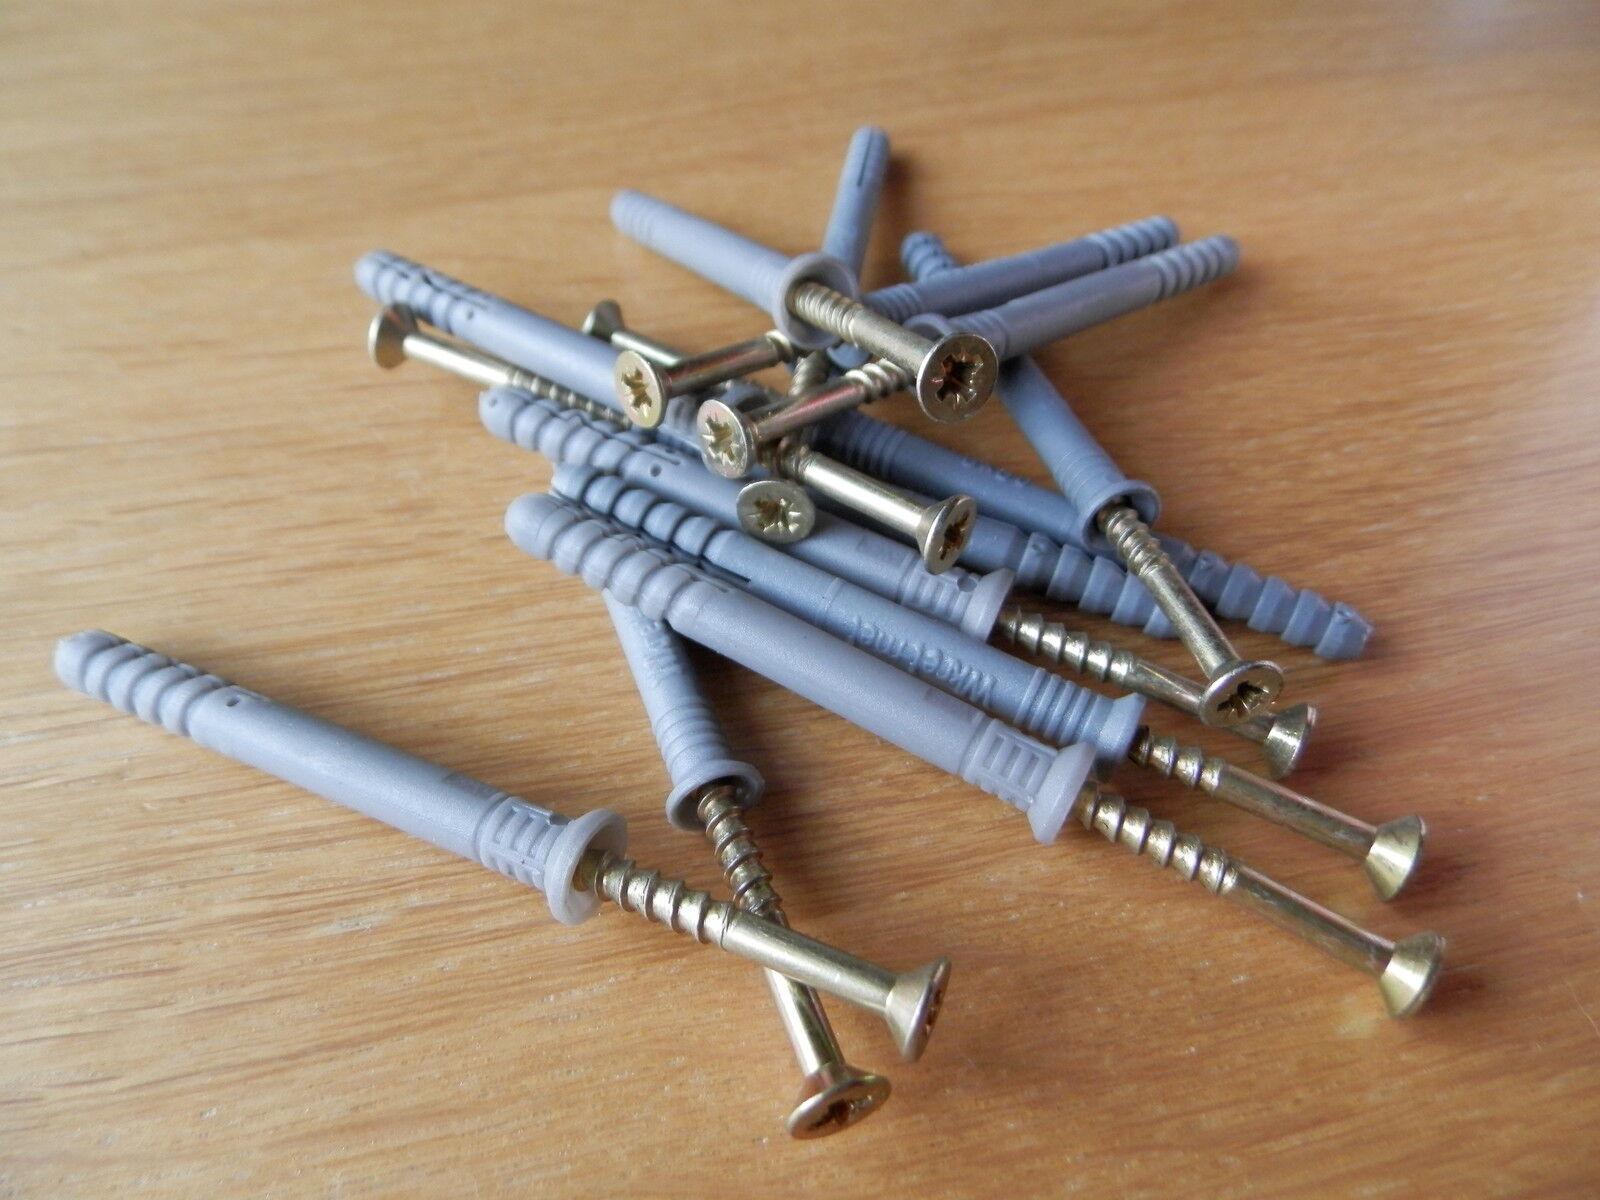 800 Schlagdübel 8x60 Nageldübel 8 8 8 x 60 mm vormontiert Senkkopf 345c0c